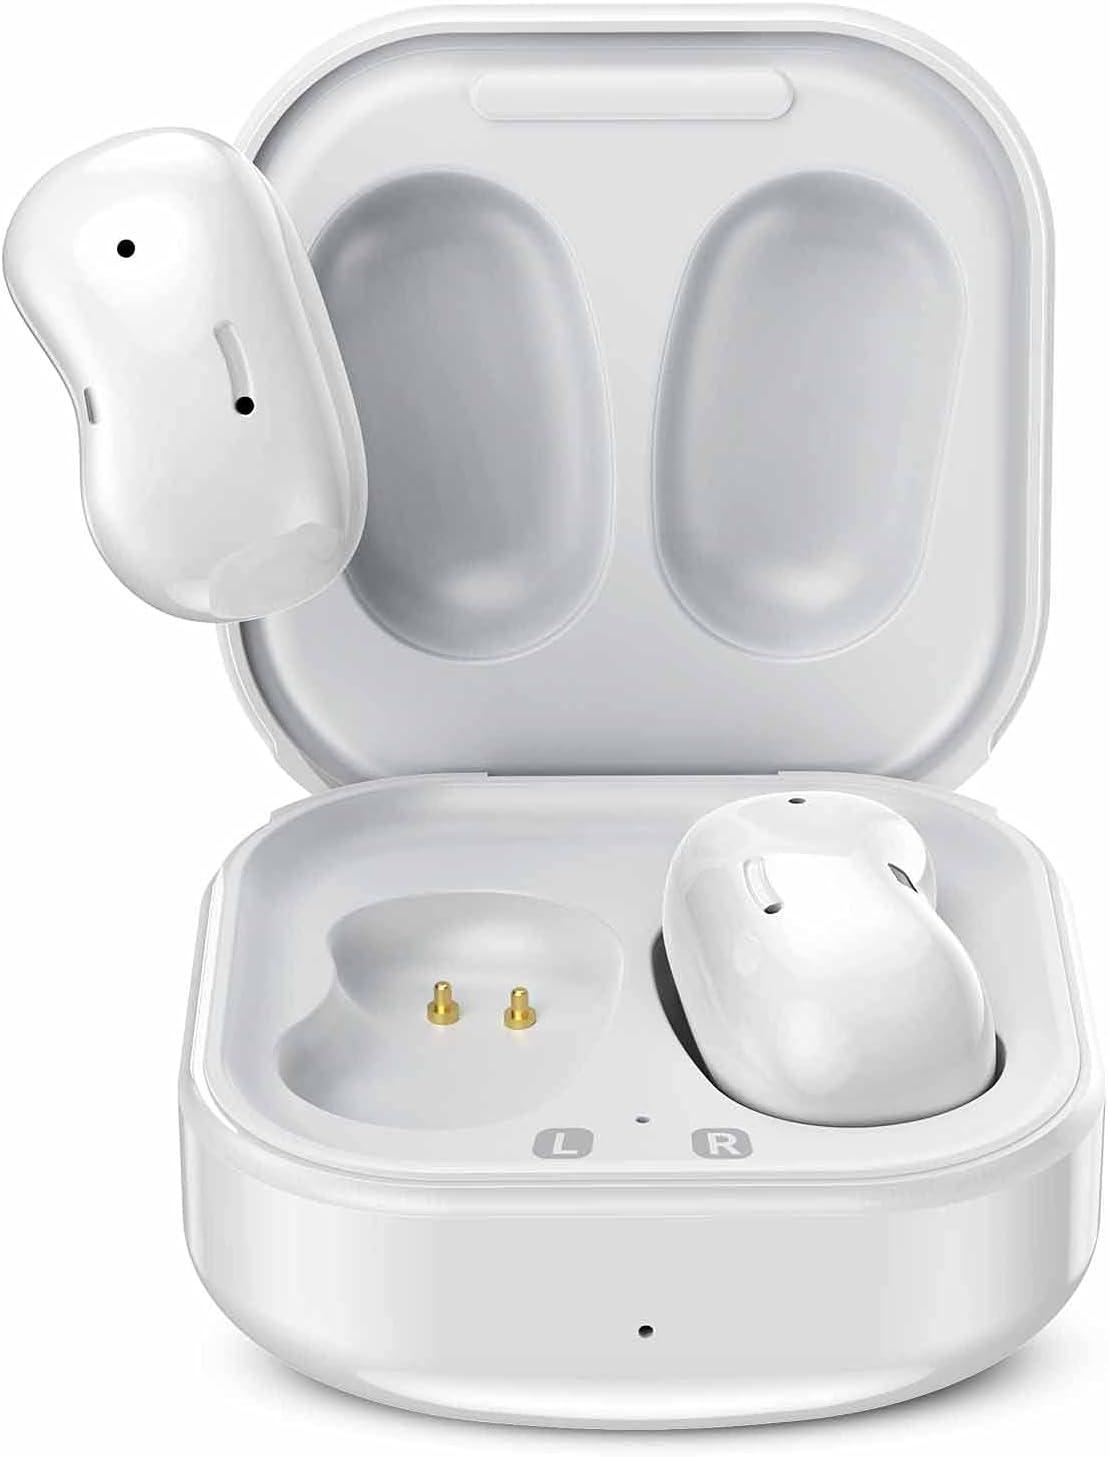 Urbanx Street Buds Lowest price challenge Live 4 years warranty True Huaw Headphones Earbud for Wireless